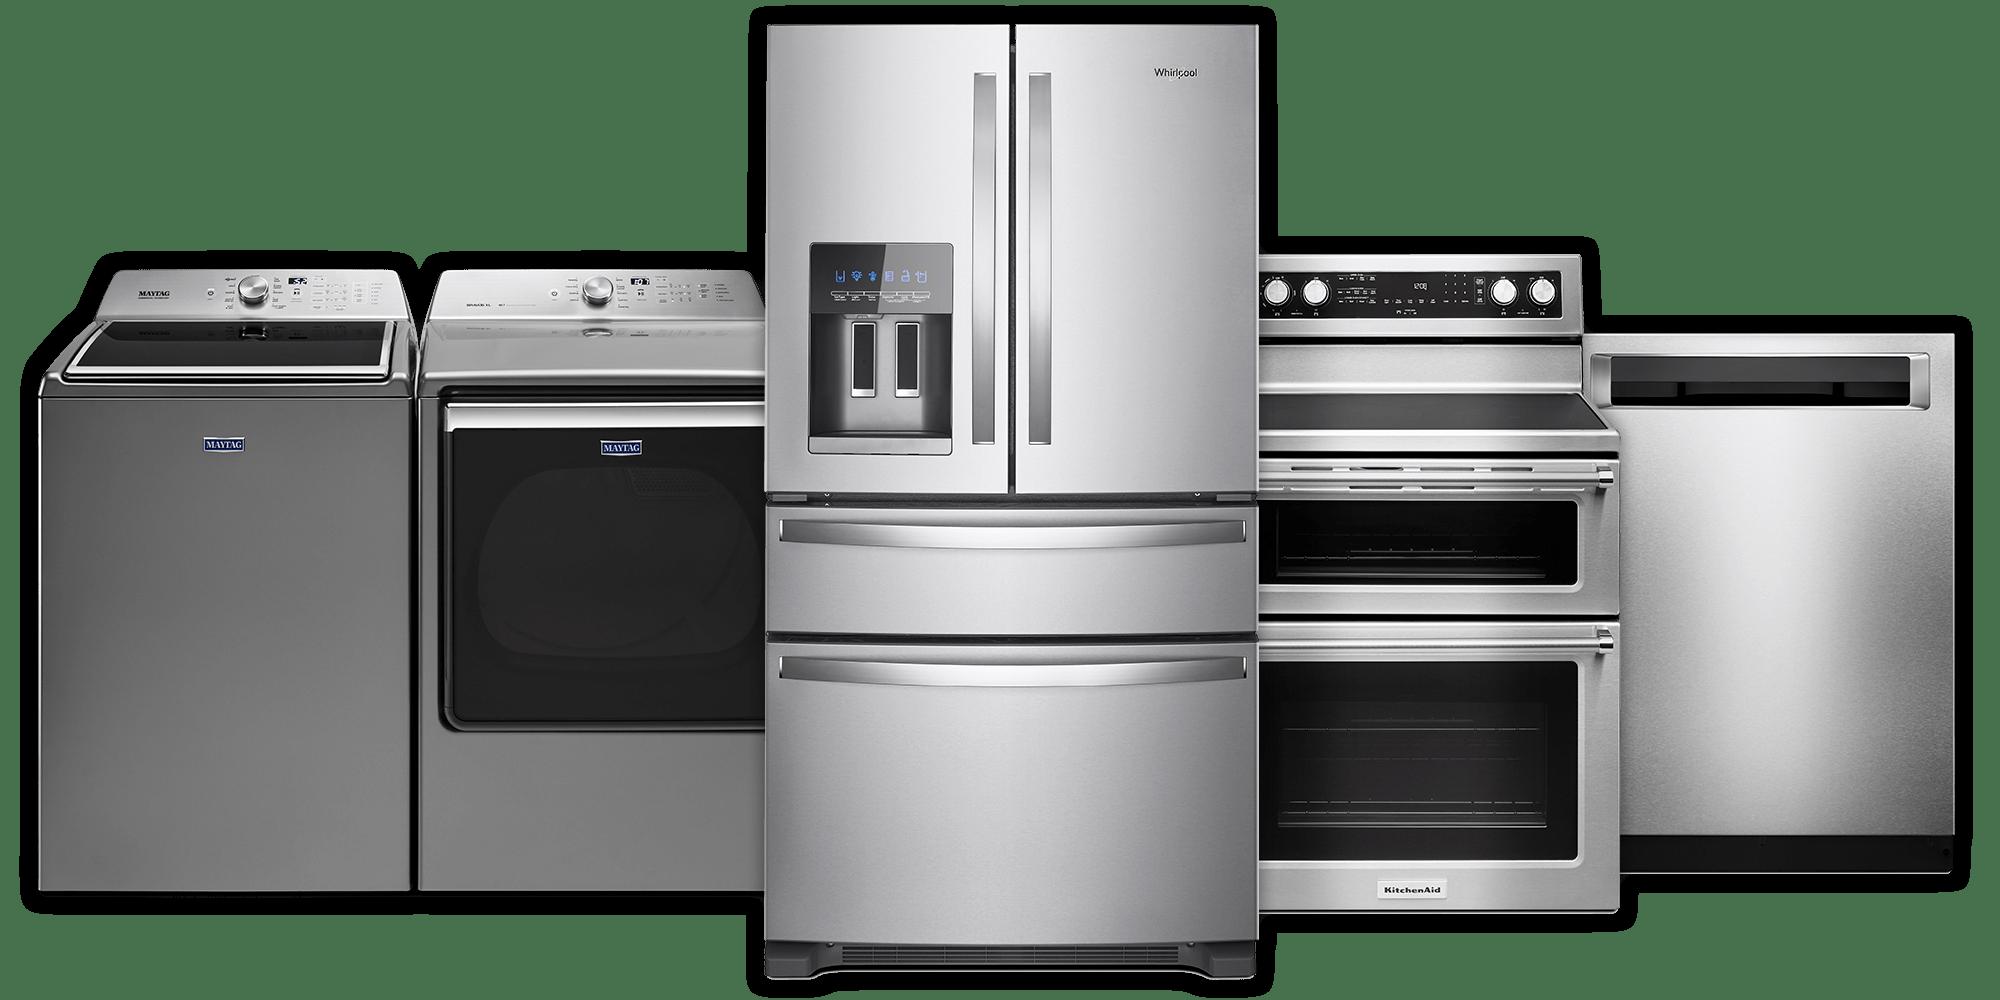 Kitchen Appliances & Appliance Service in Lincoln, IL